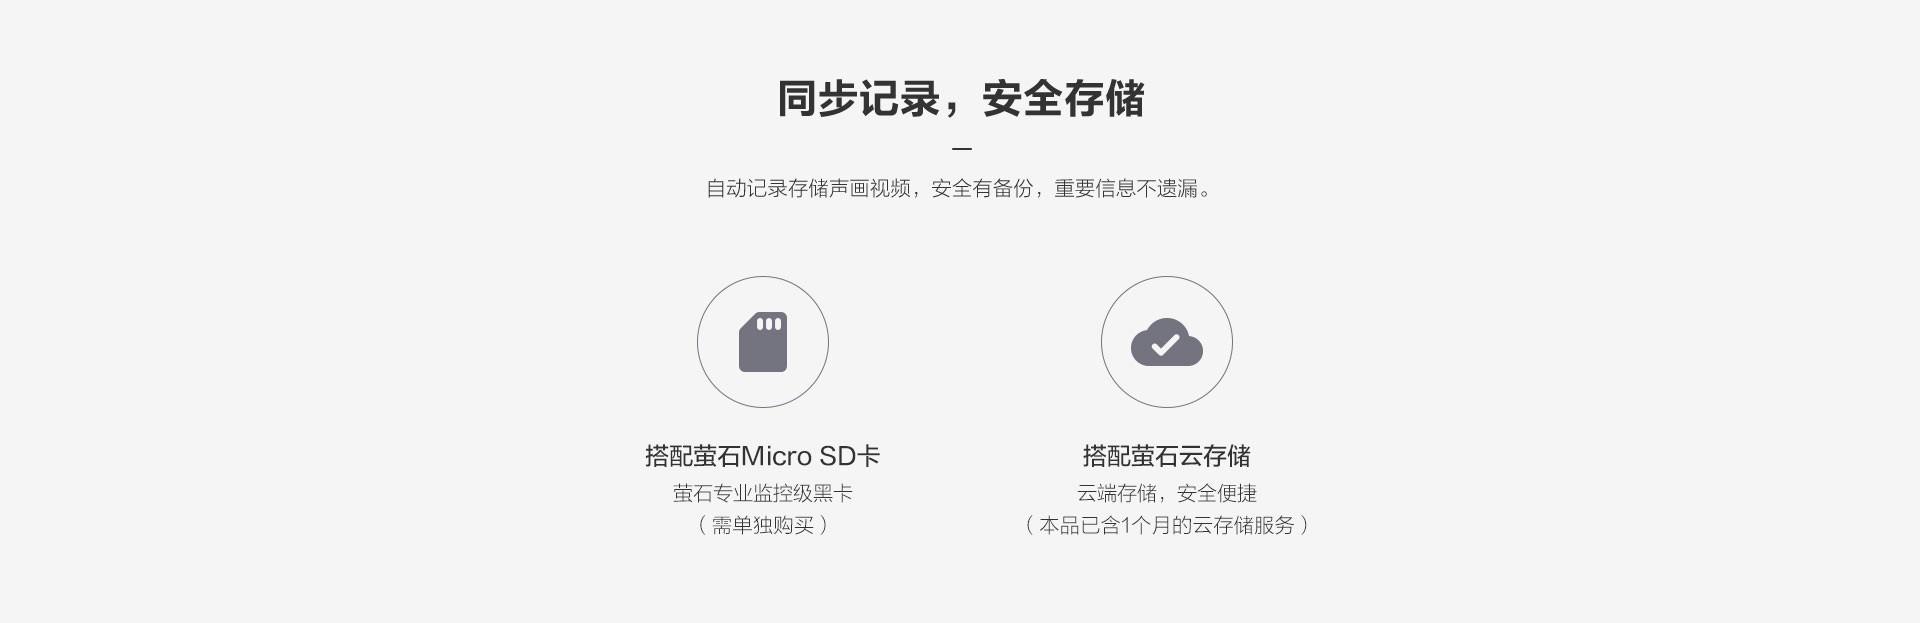 C5HC标准版wifi-web2_07.jpg